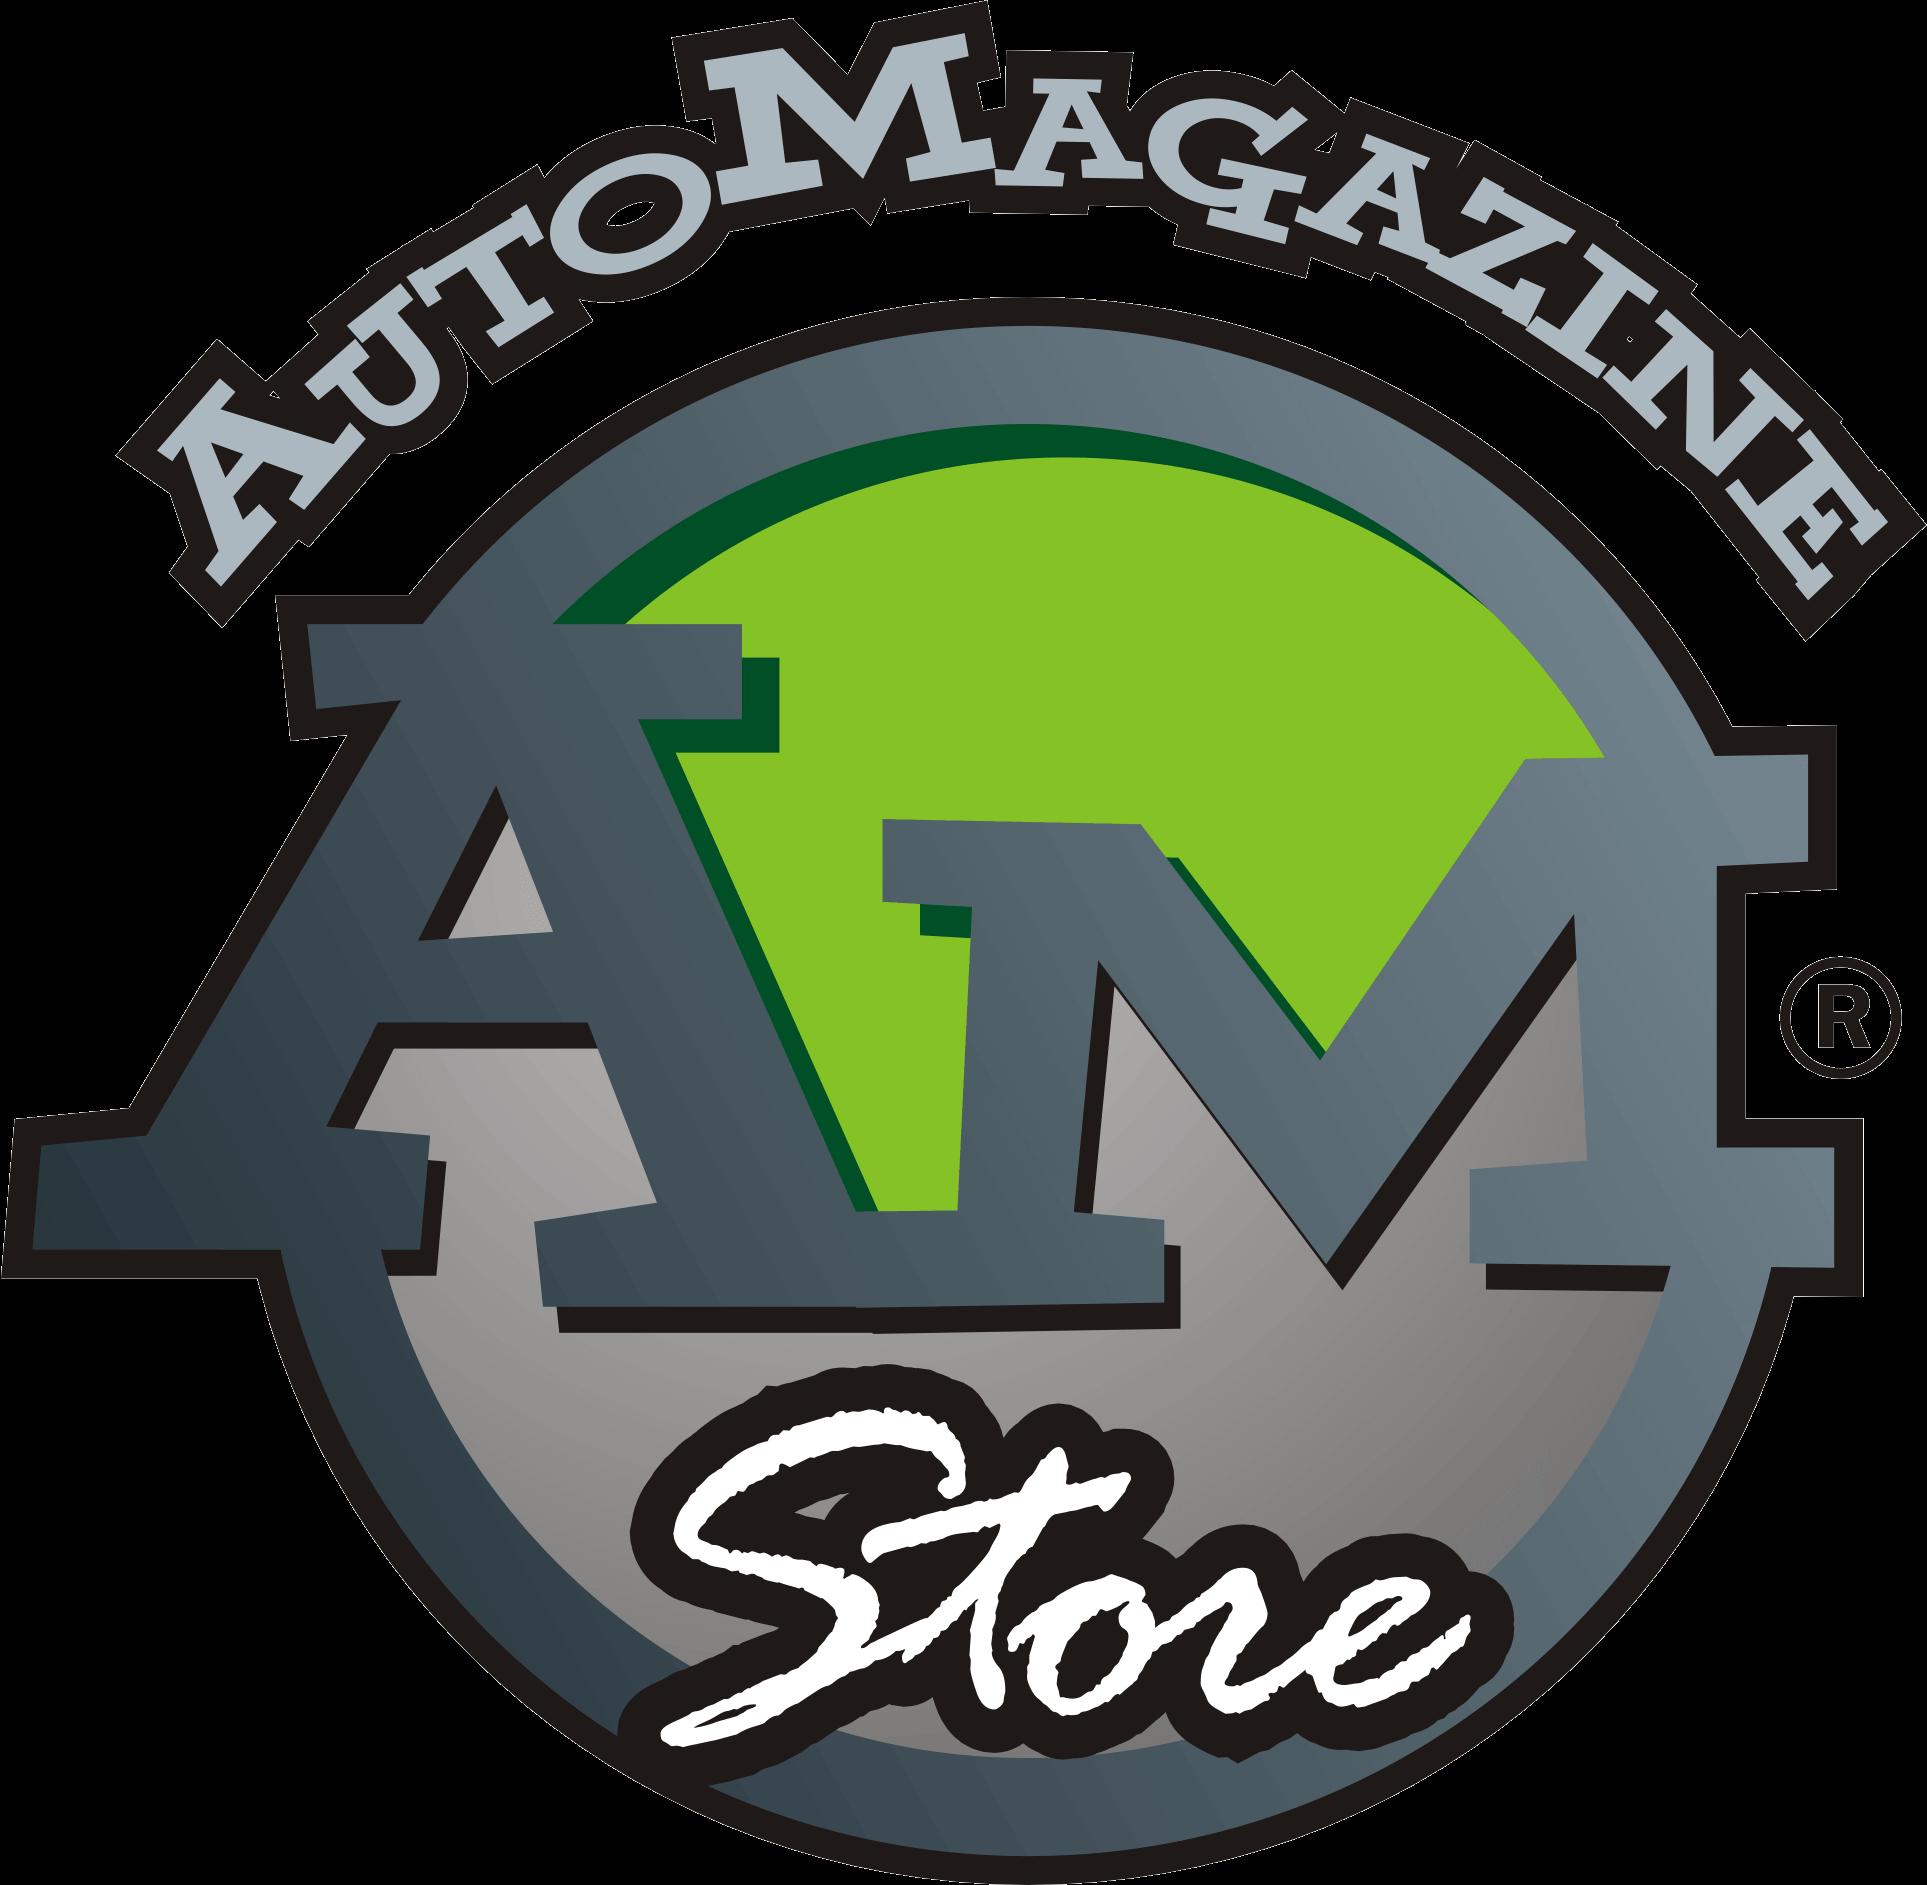 AM Store logo